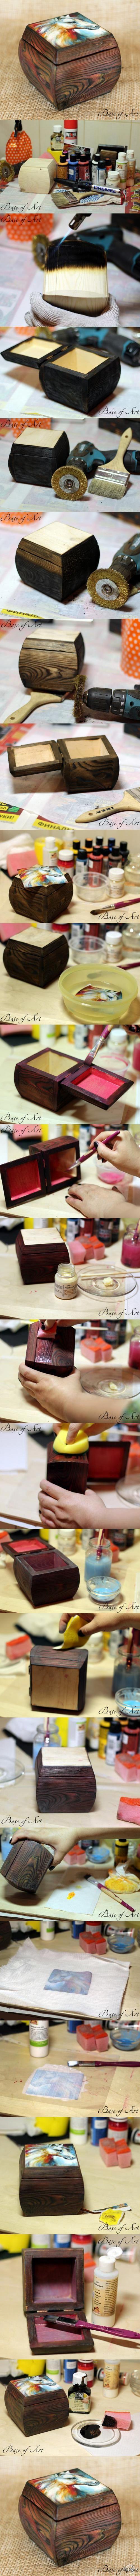 "Декупаж - Сайт любителей декупажа - DCPG.RU | Шкатулка ""Мечта"". Мастер-класс от ""Base of Art"". Click on photo to see more! Нажмите на фото чтобы увидеть больше! decoupage art craft handmade home decor DIY do it yourself tutorial Materials and techniques: decoupage card acrylic paint wax varnish napkins etc."